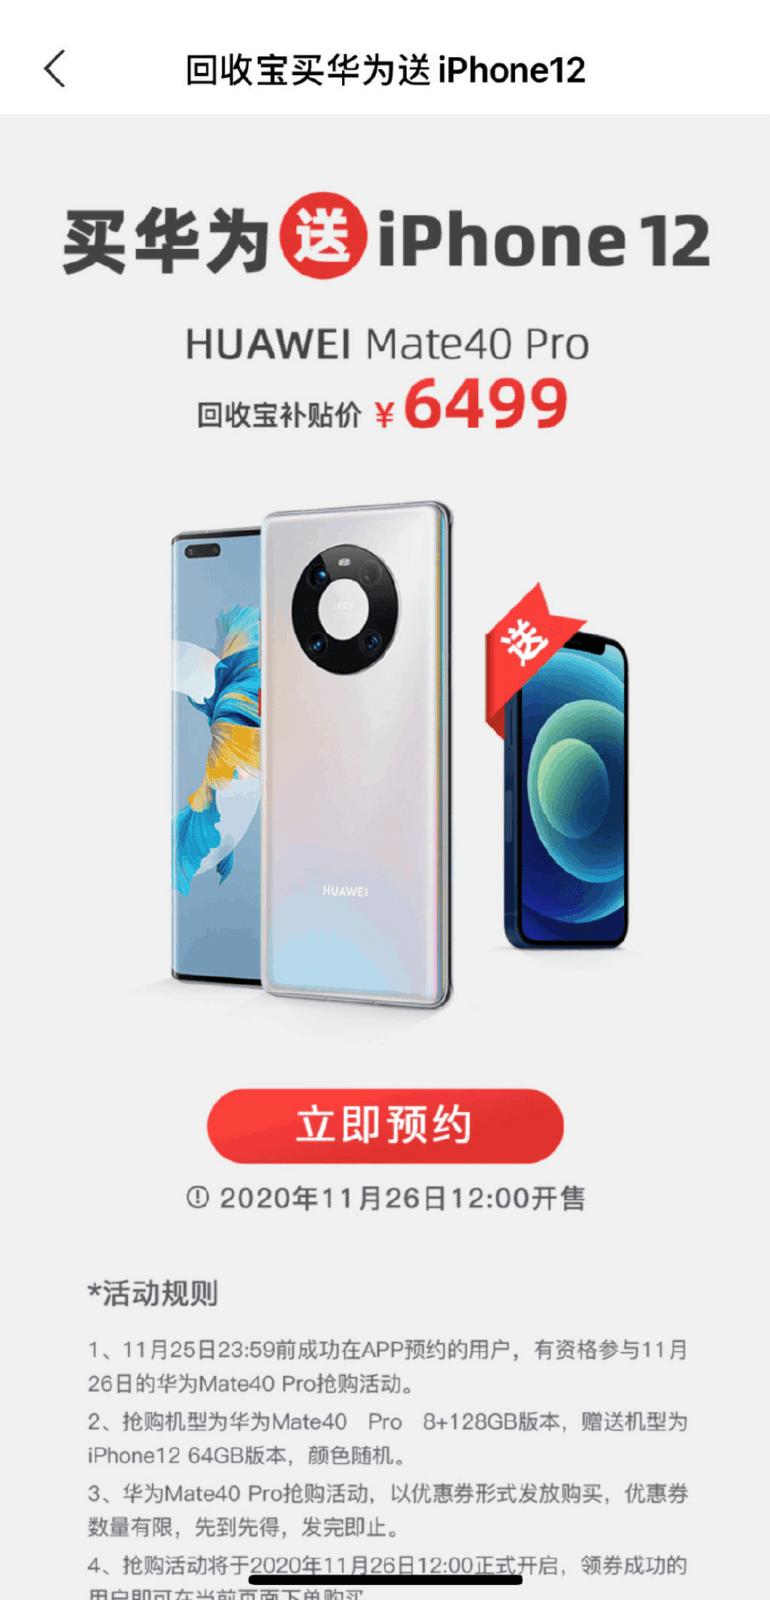 Купите Huawei Mate 40 Pro и получите iPhone 12 бесплатно (b68fc556c5654643bb9d361acaba26ba)